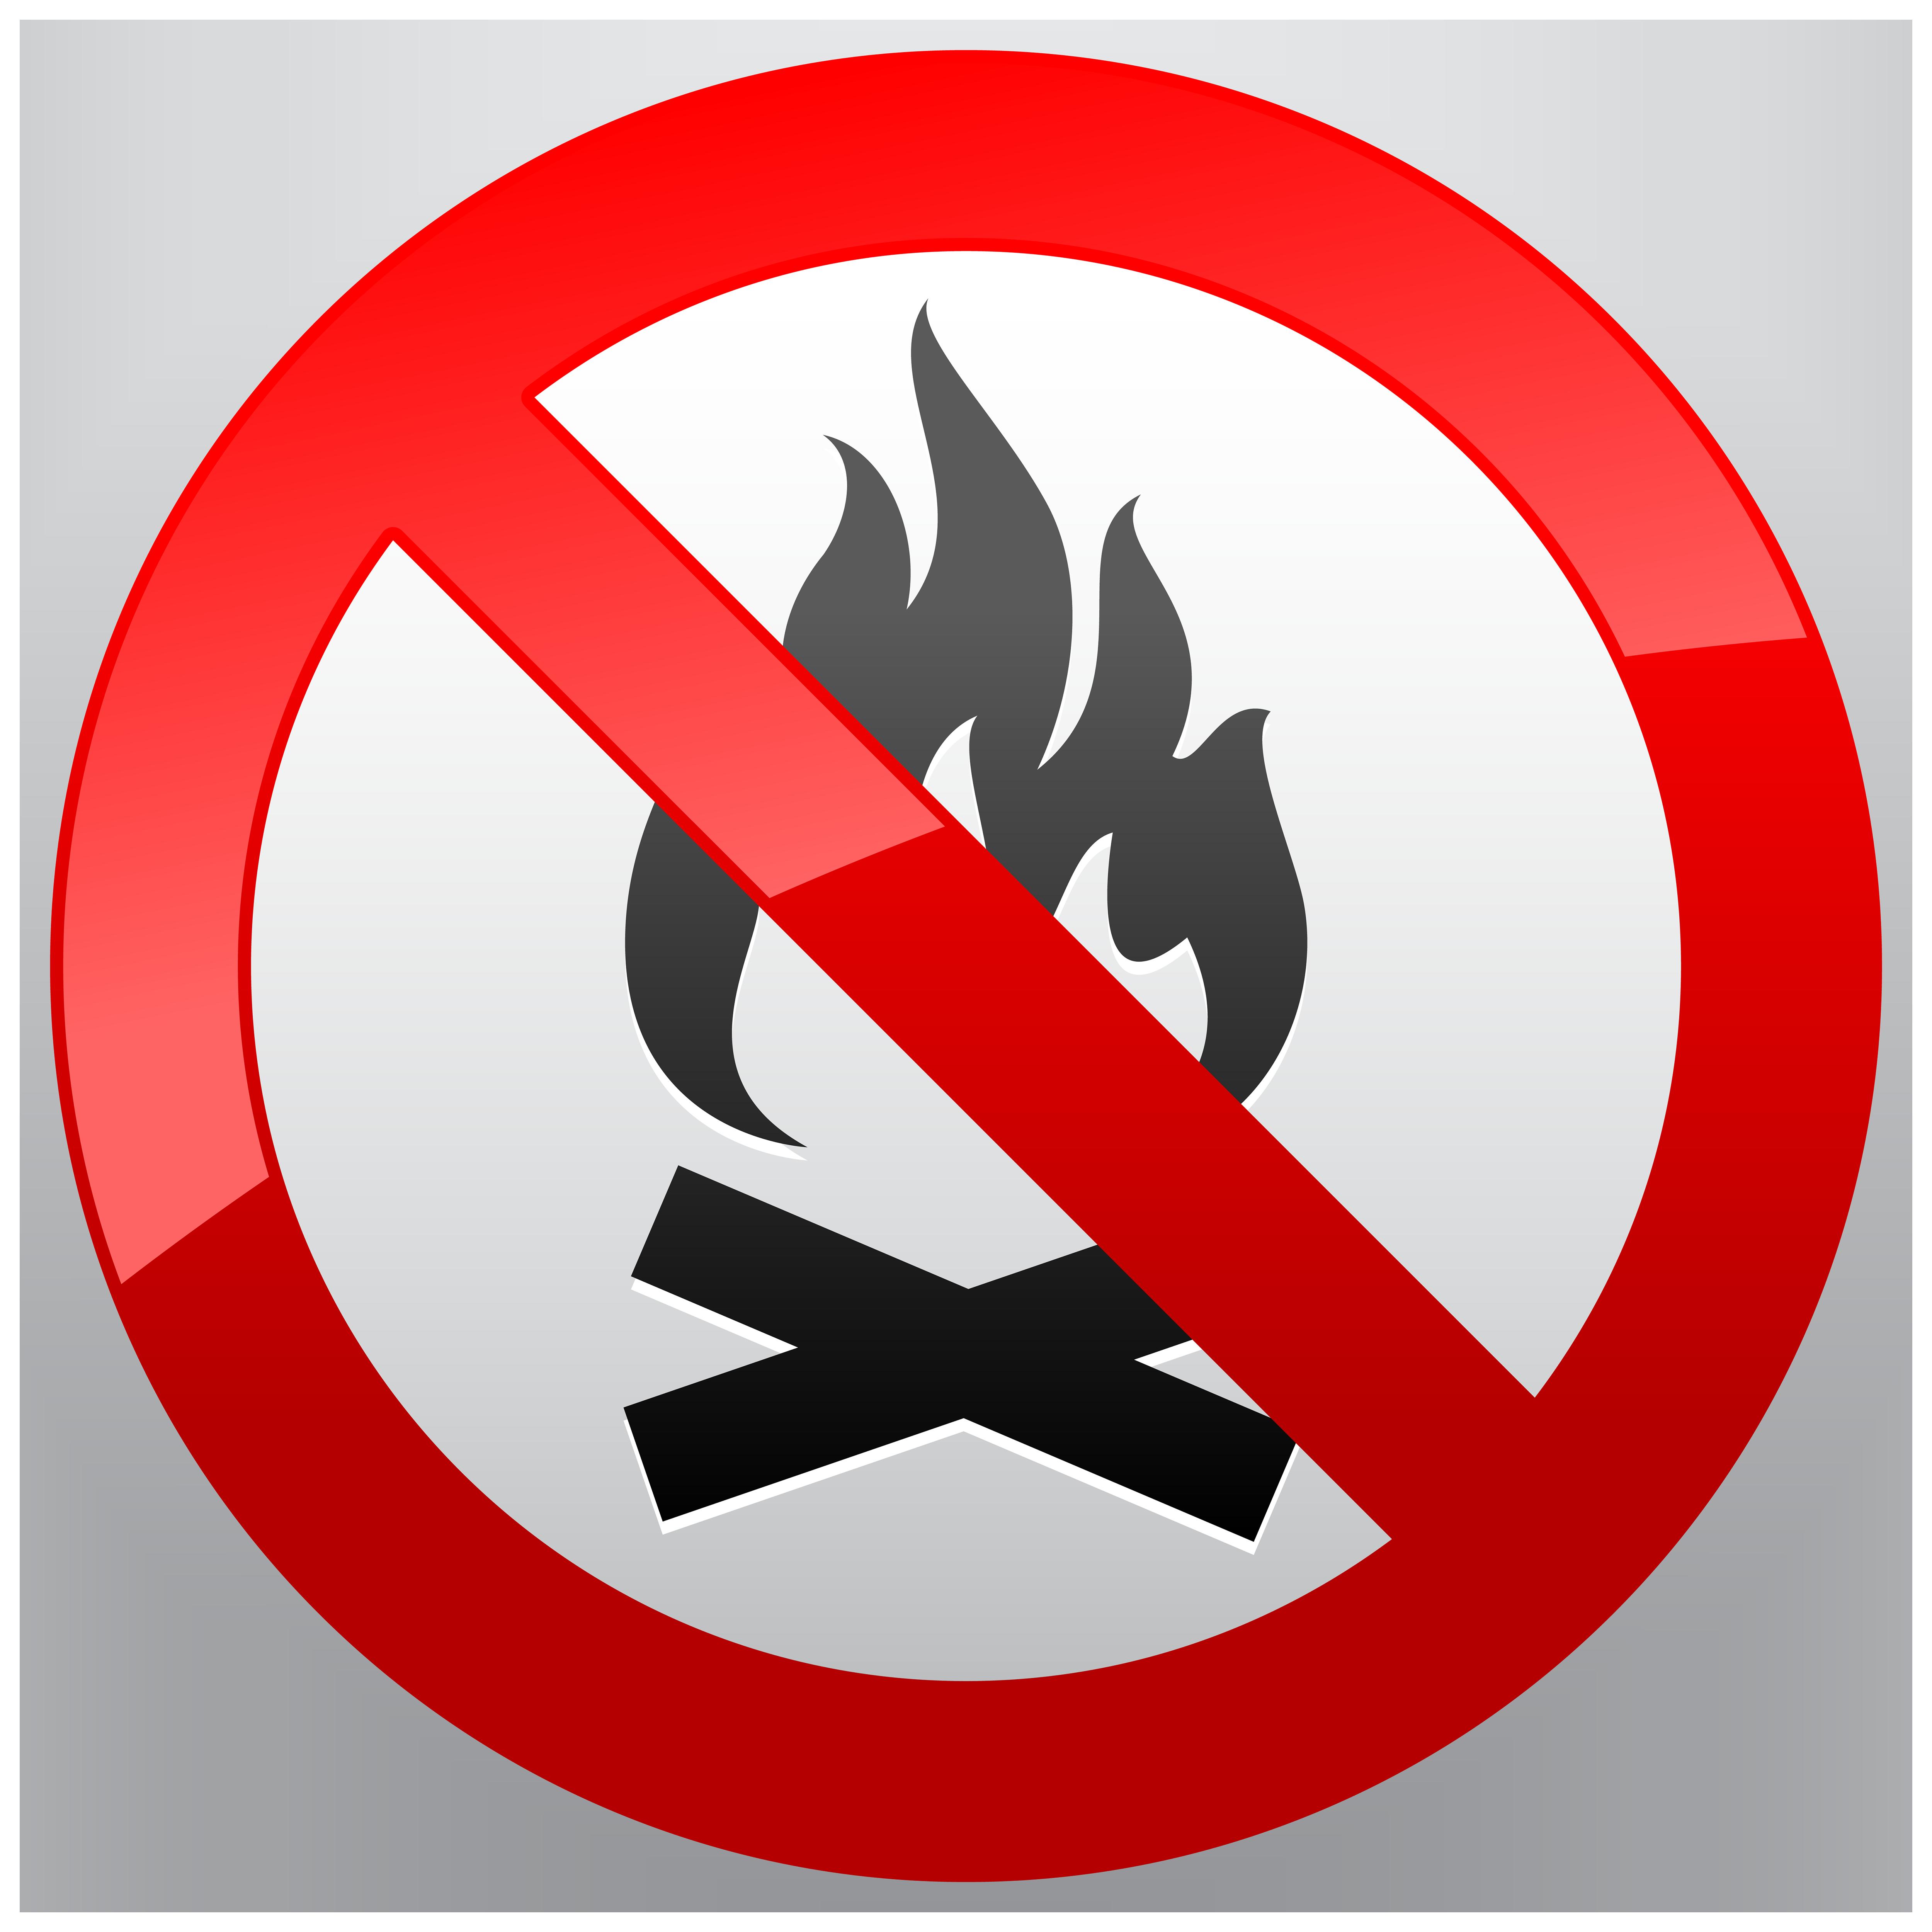 png transparent Fire prohibition sign png. No clipart